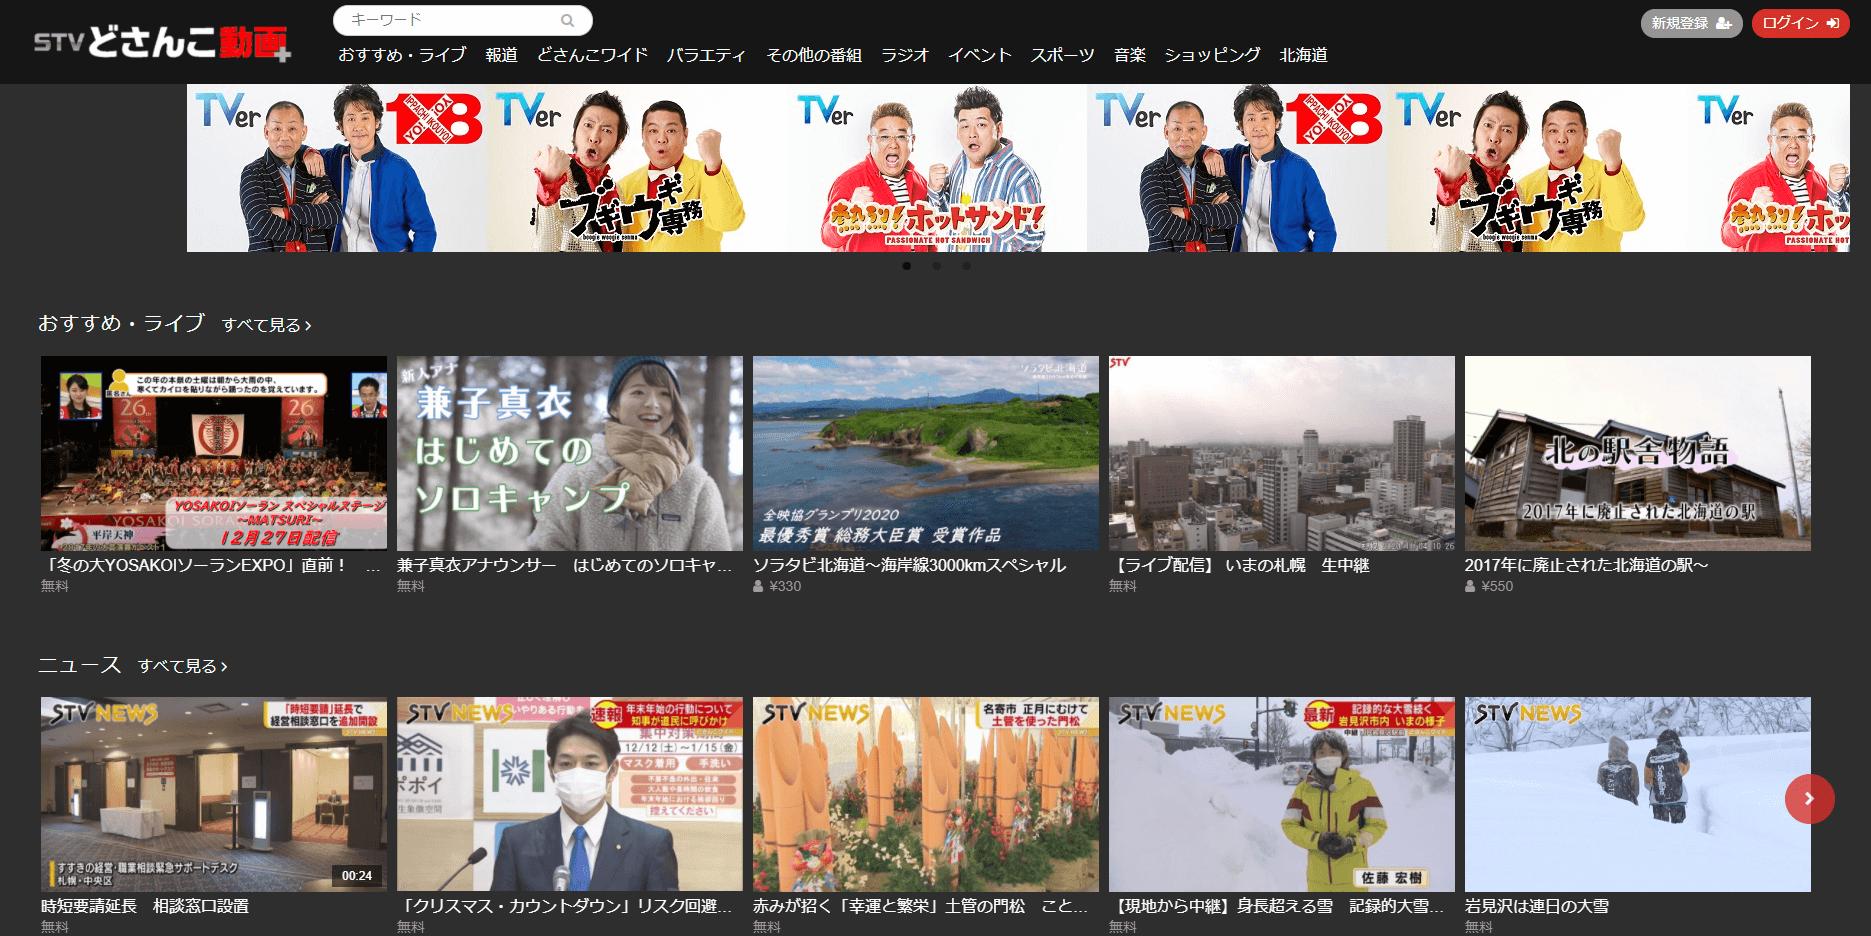 『STVどさんこ動画+(プラス)』のラインナップ